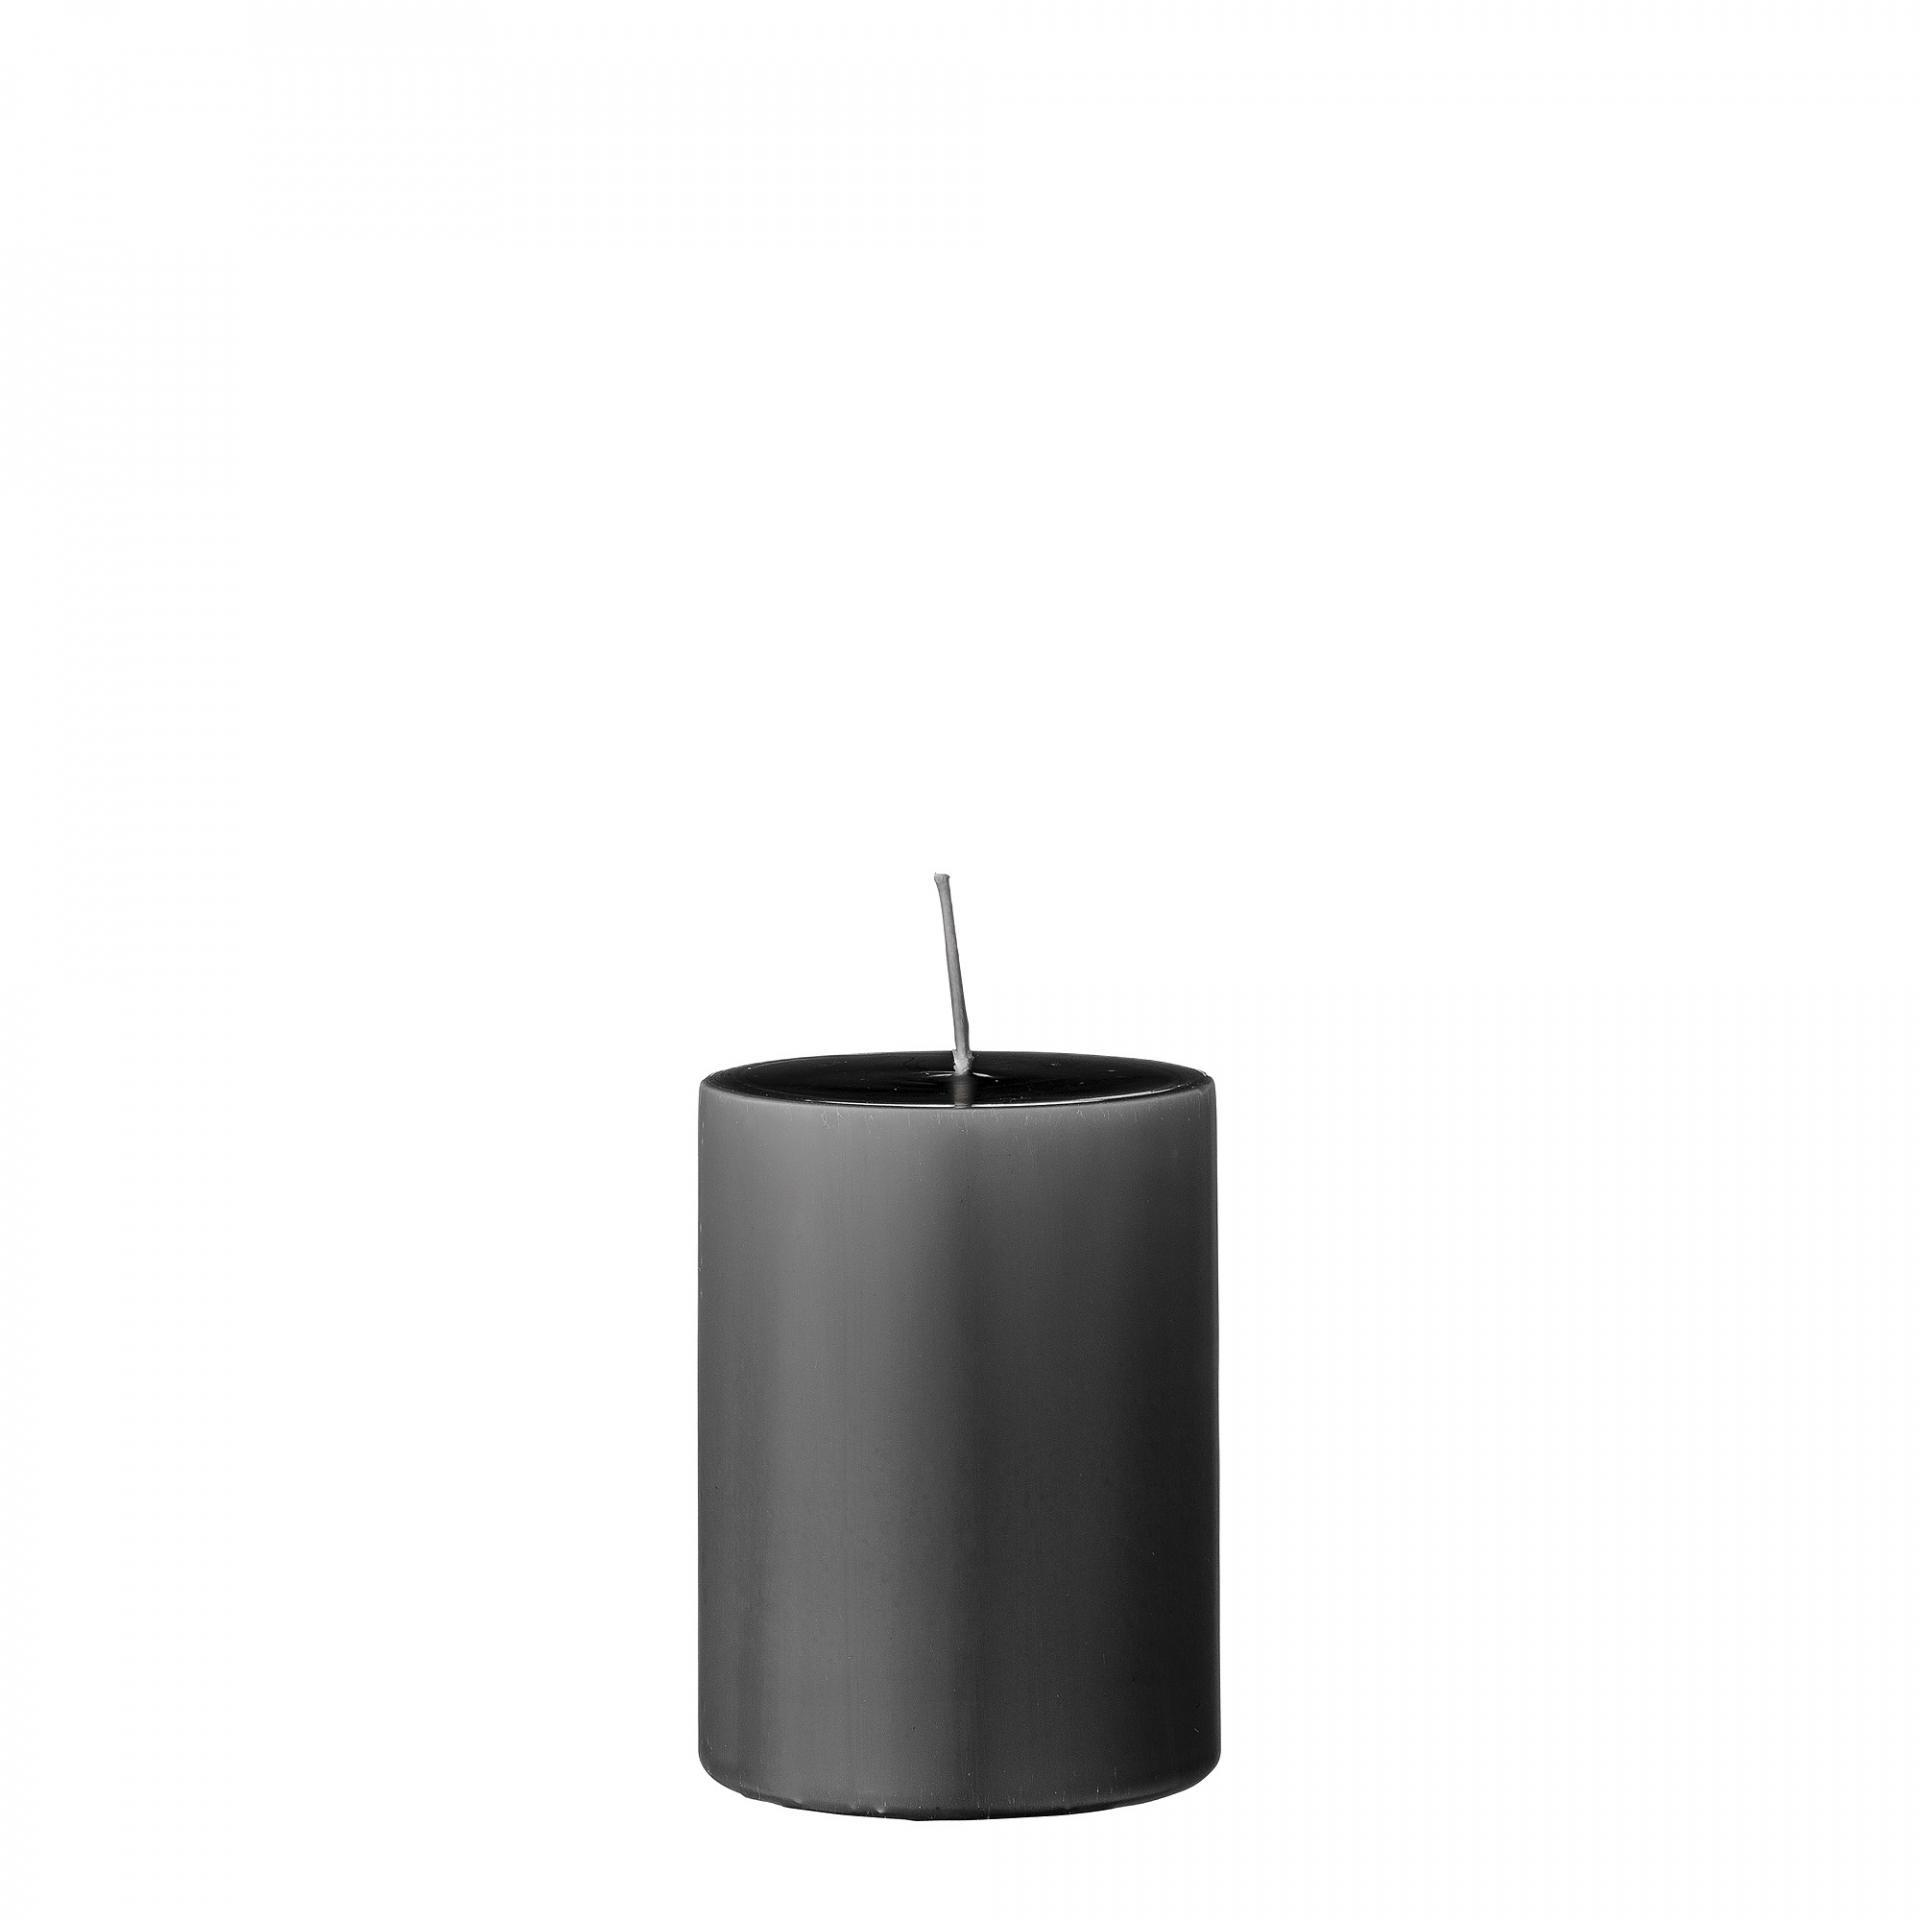 Bloomingville Svíčka Grey 10 cm, šedá barva